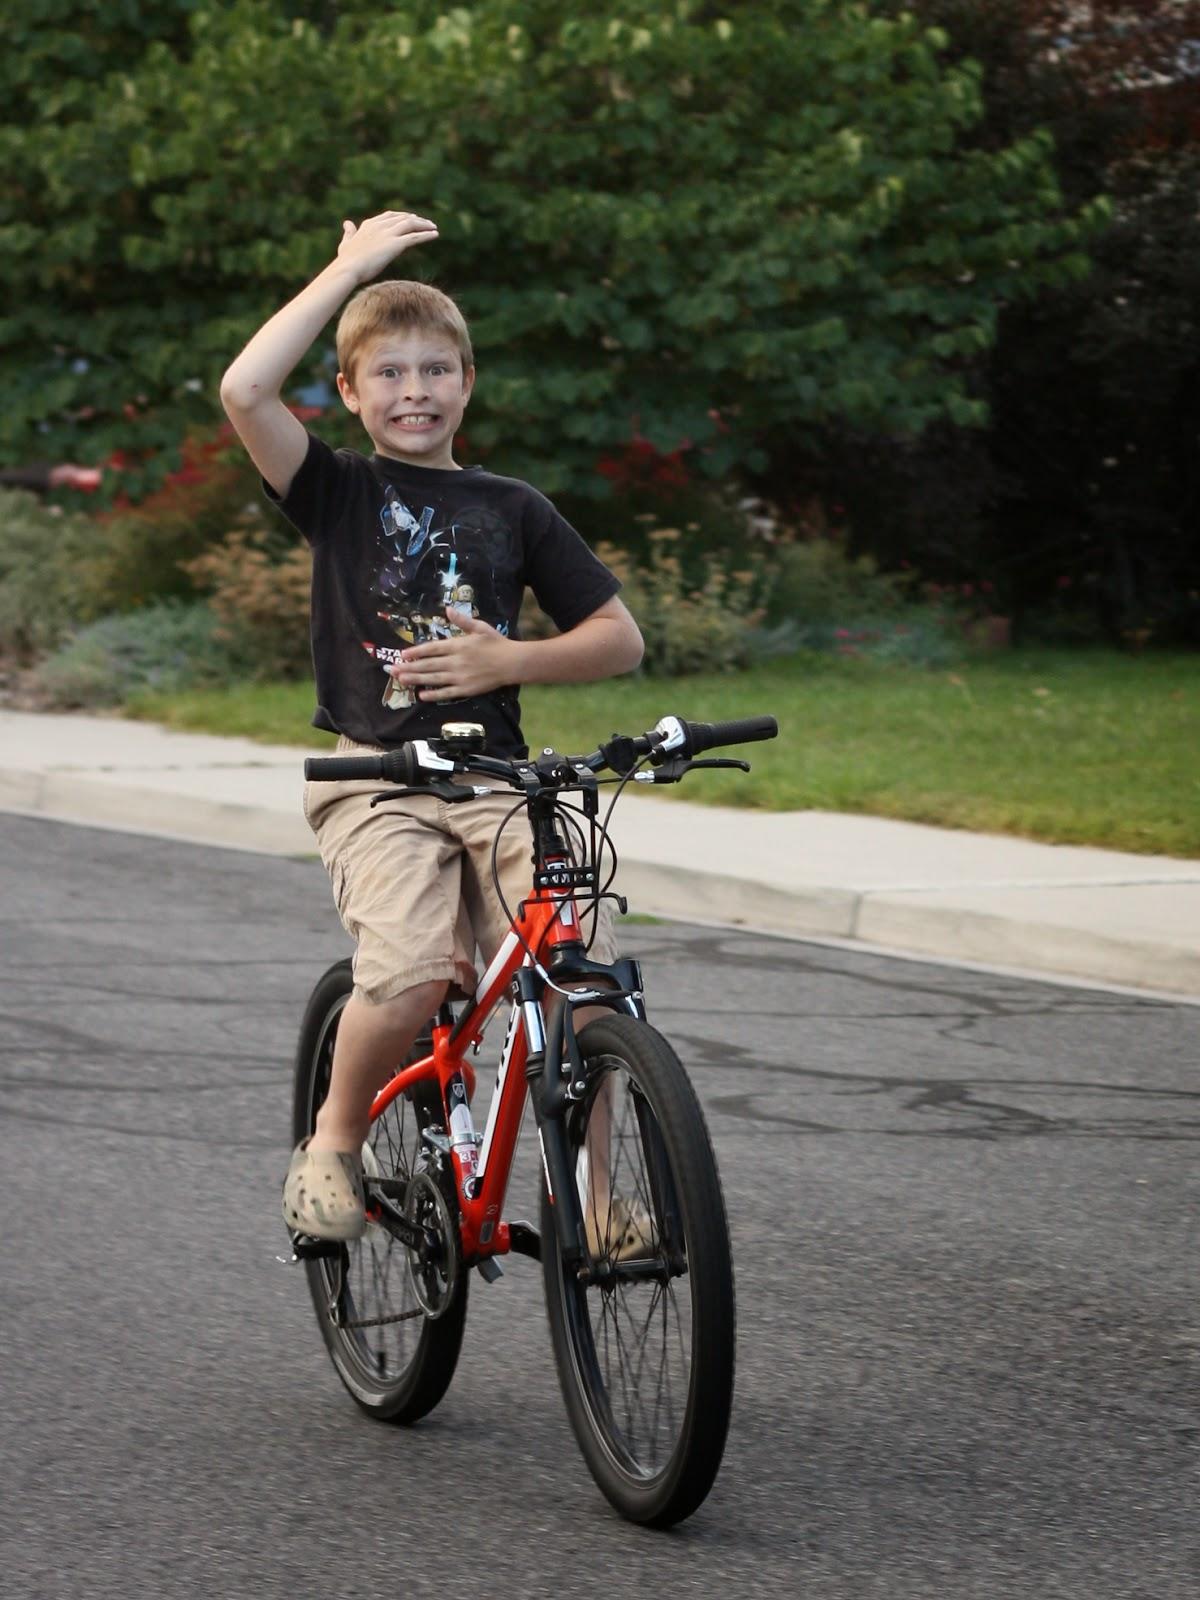 Morningstar Happenings I Can Ride My Bike With No Handlebars